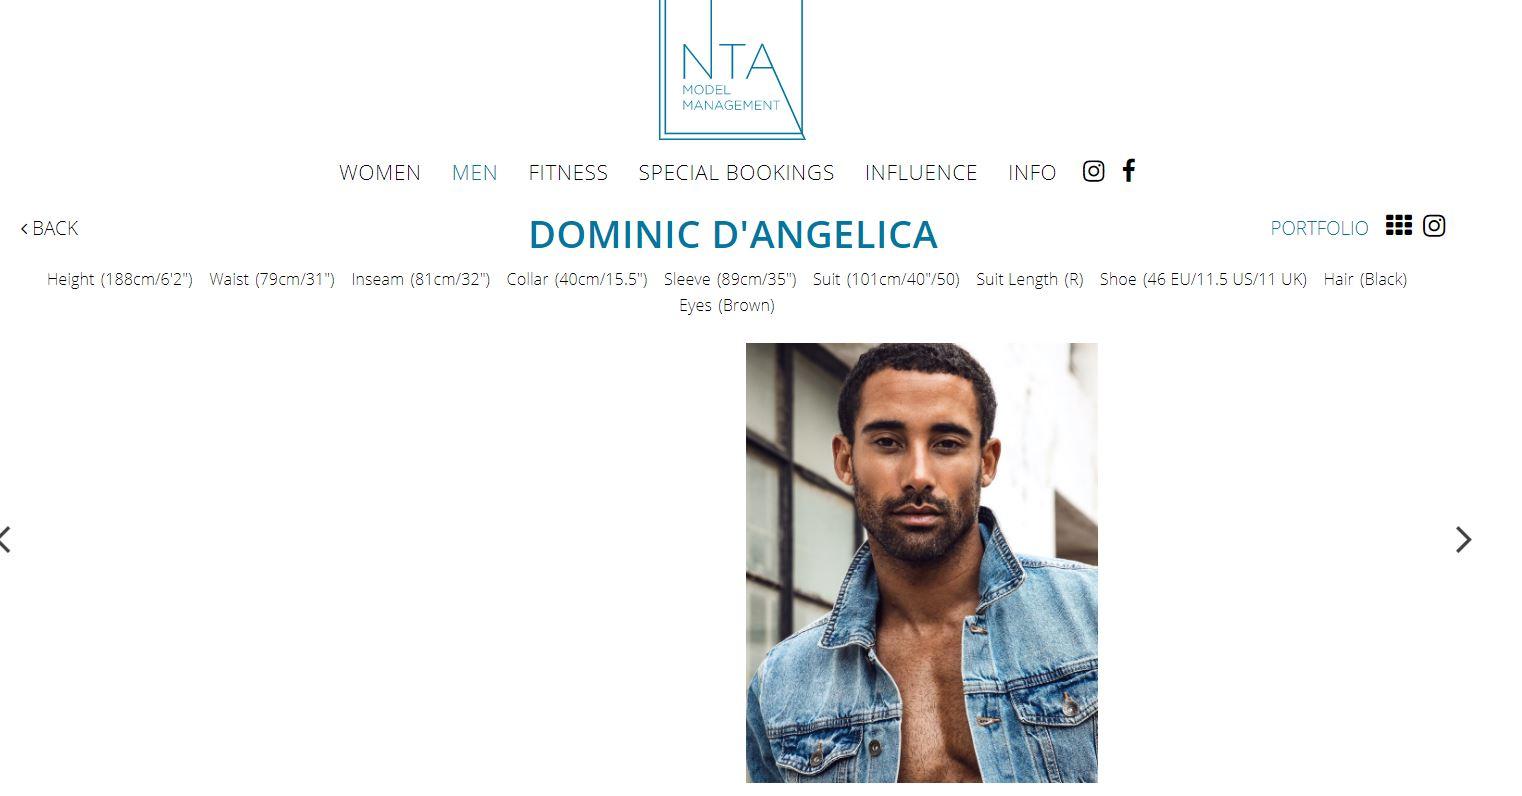 Dominic D'Angelica, fot. screenshot NTA Model Management